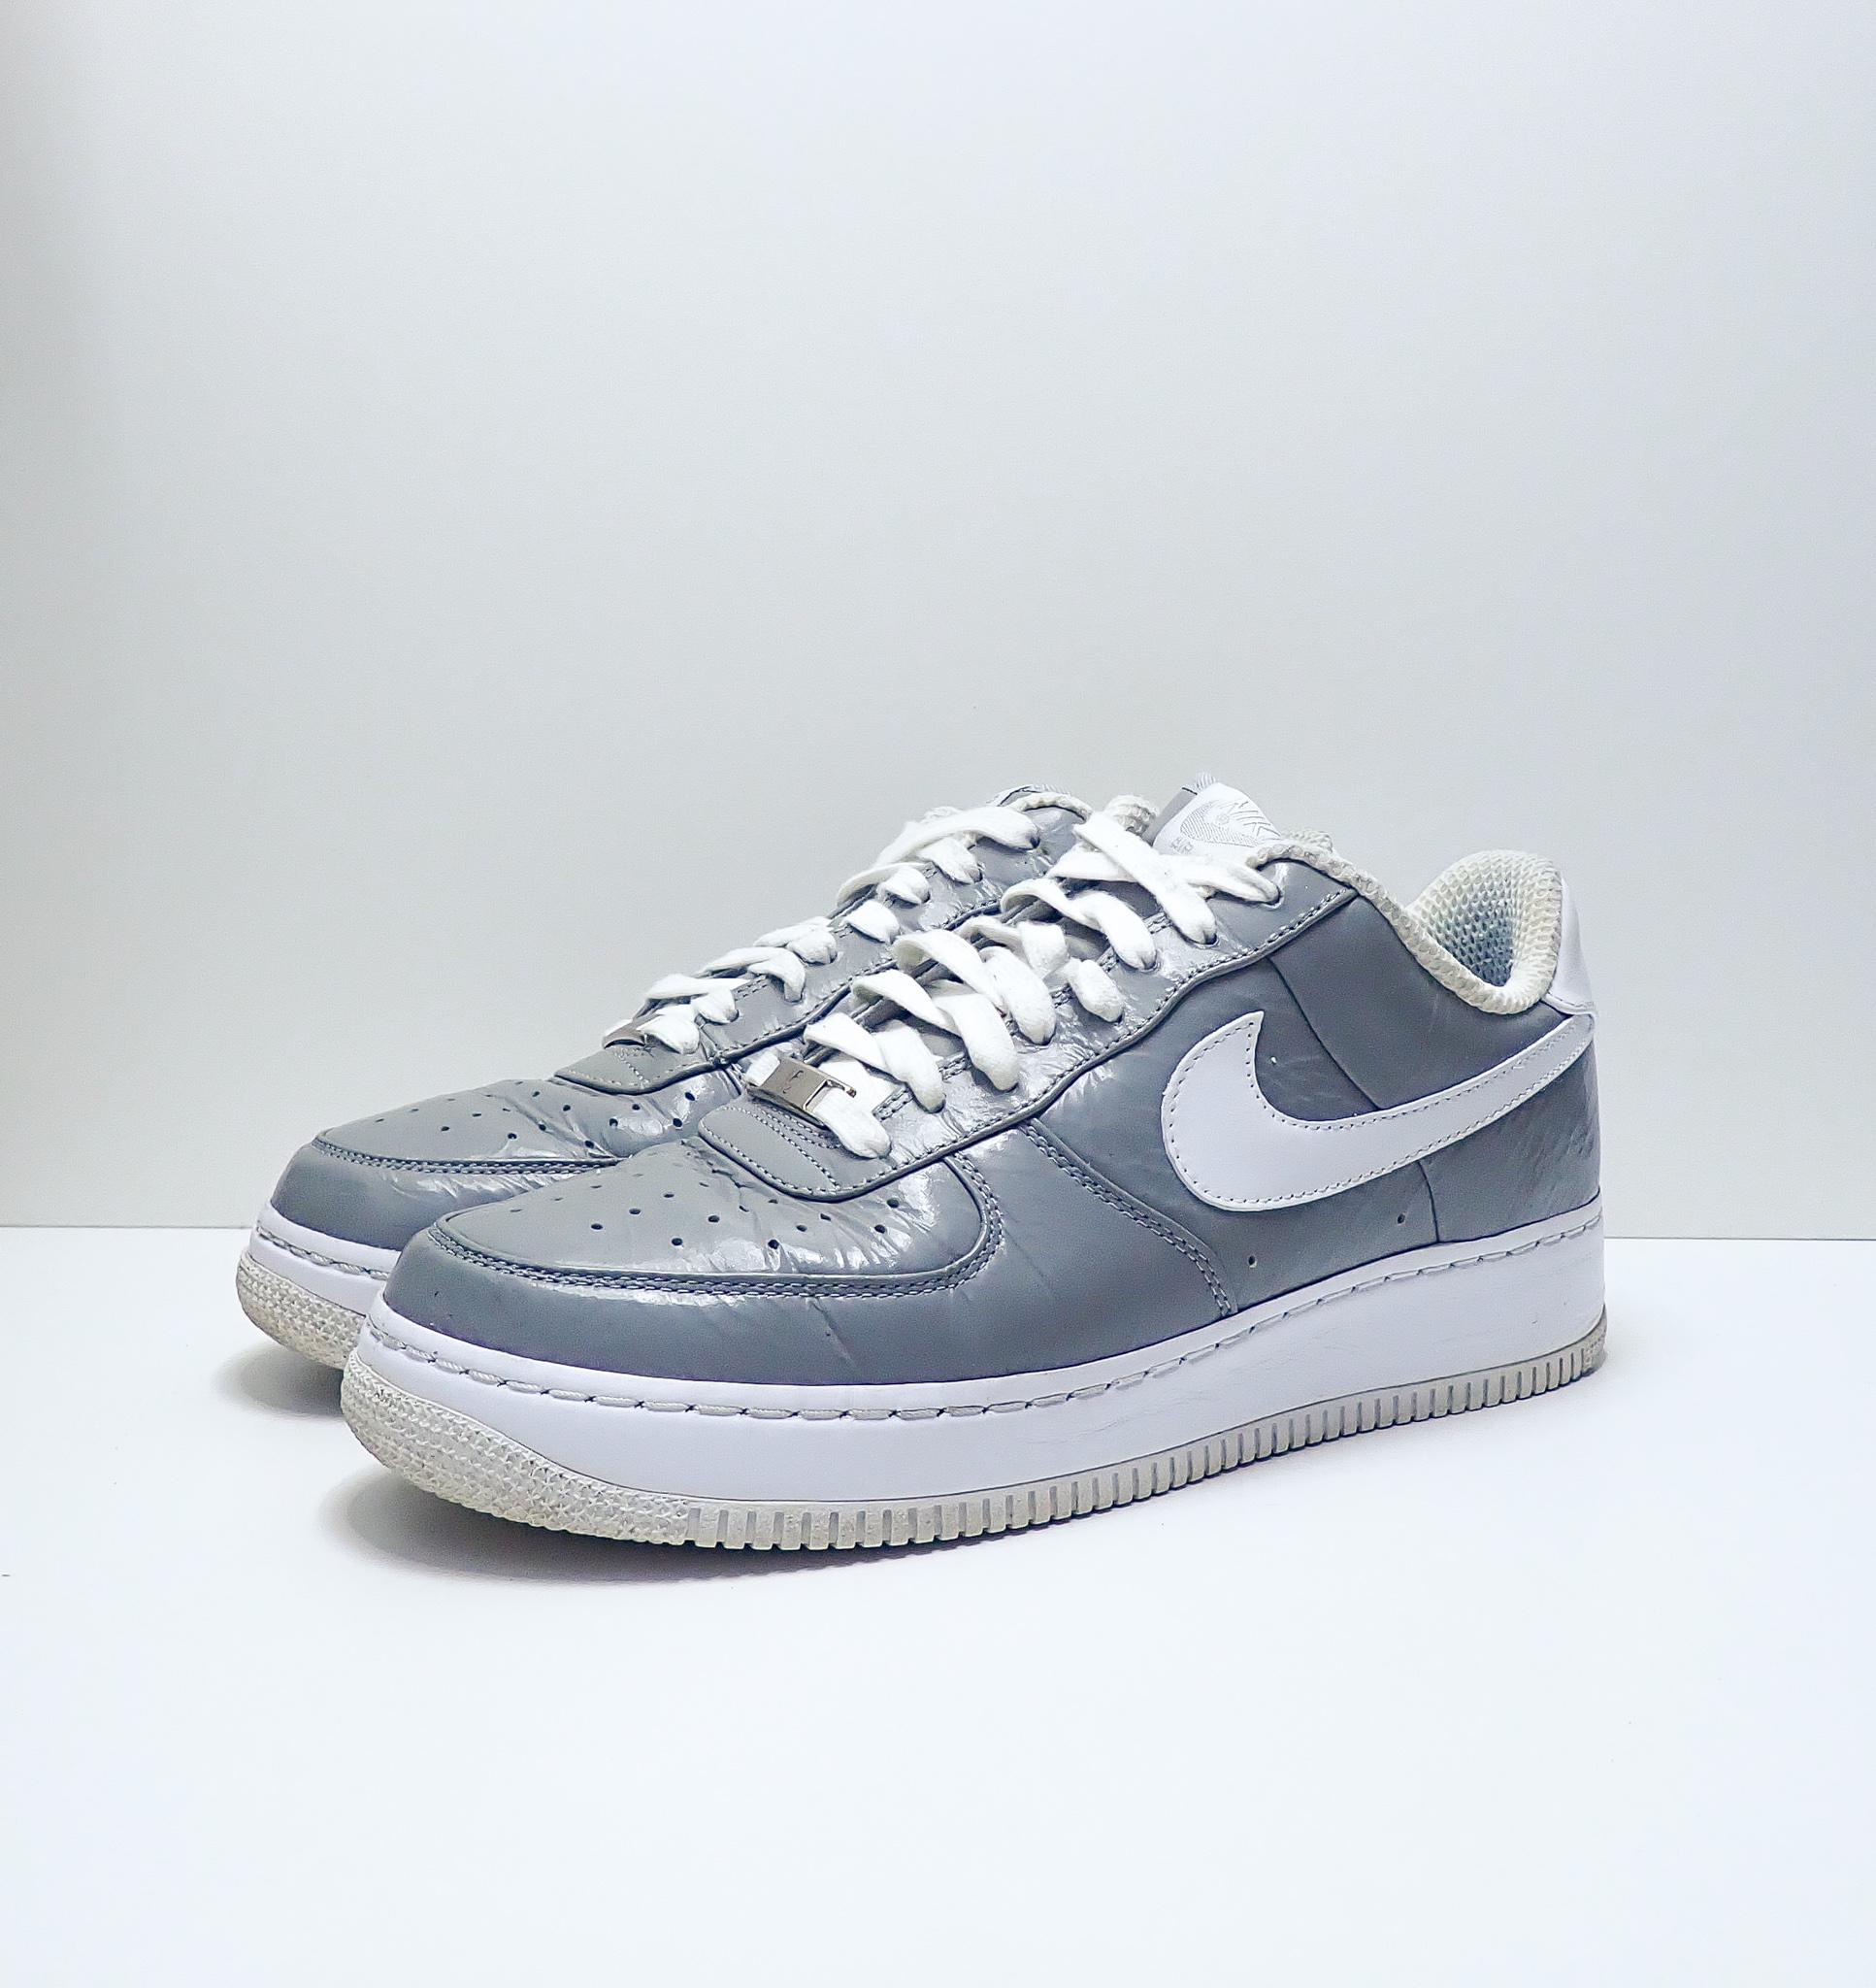 Nike Air Force 1 Low Insideout Slam Jam